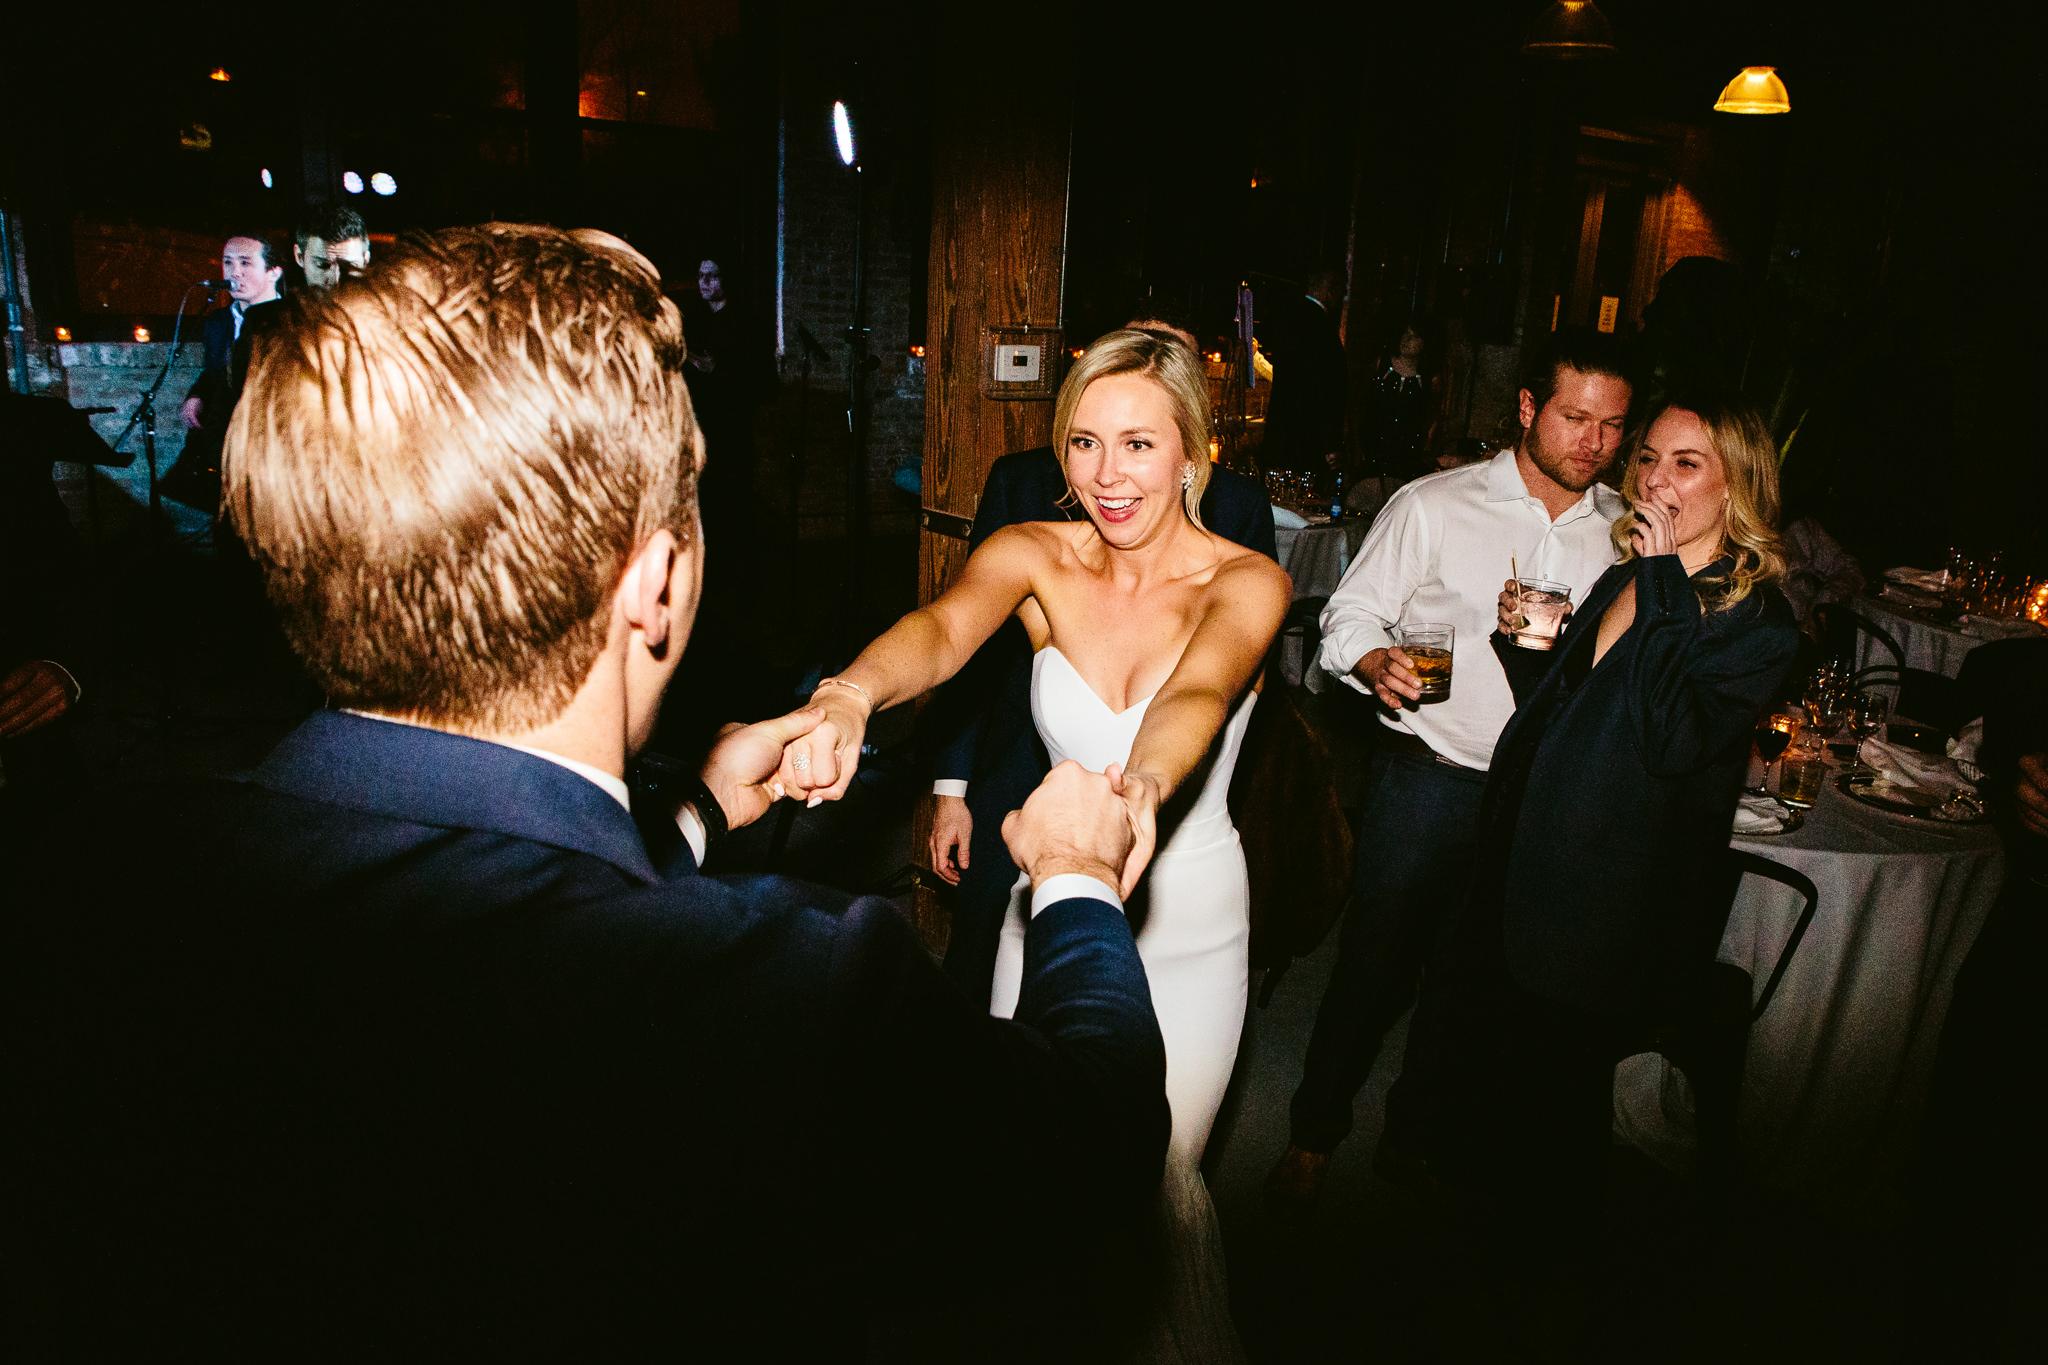 nicodem-creative-chicago-wedding-photography-videography-inspira